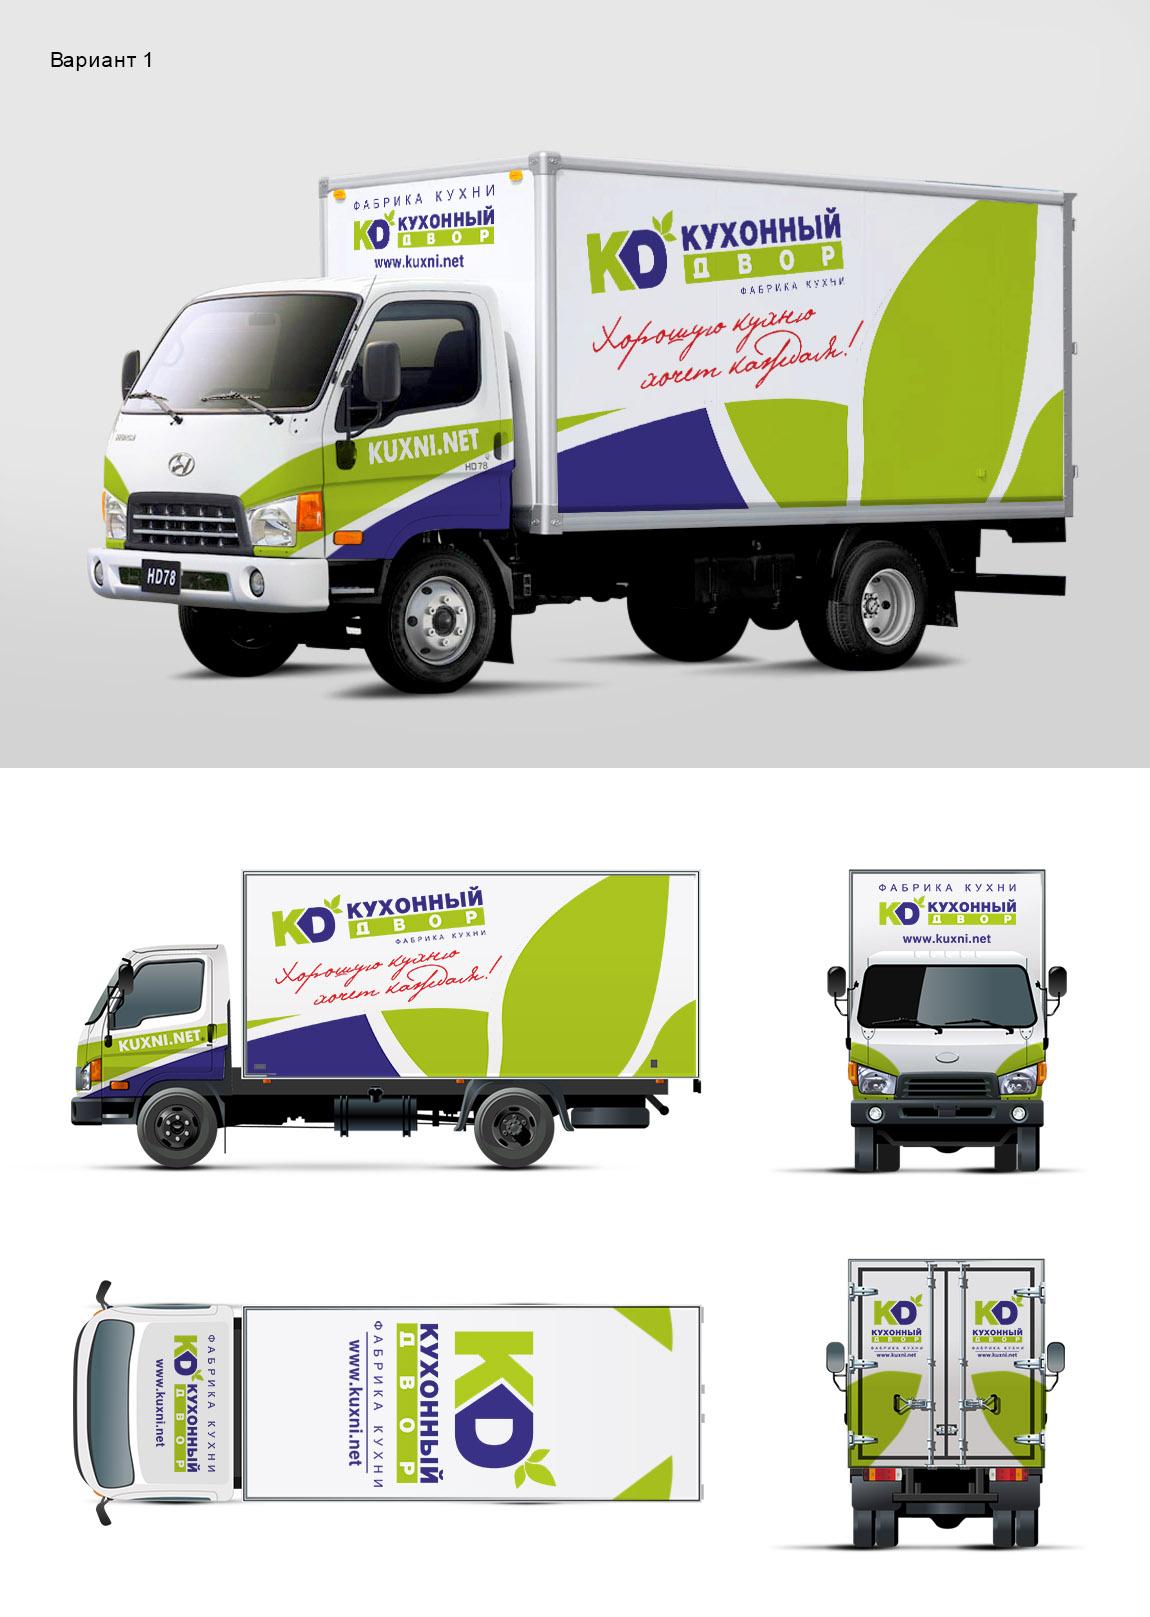 "Брендирование грузового авто для компании ""Кухонный двор"" фото f_29859c93a30b9442.jpg"